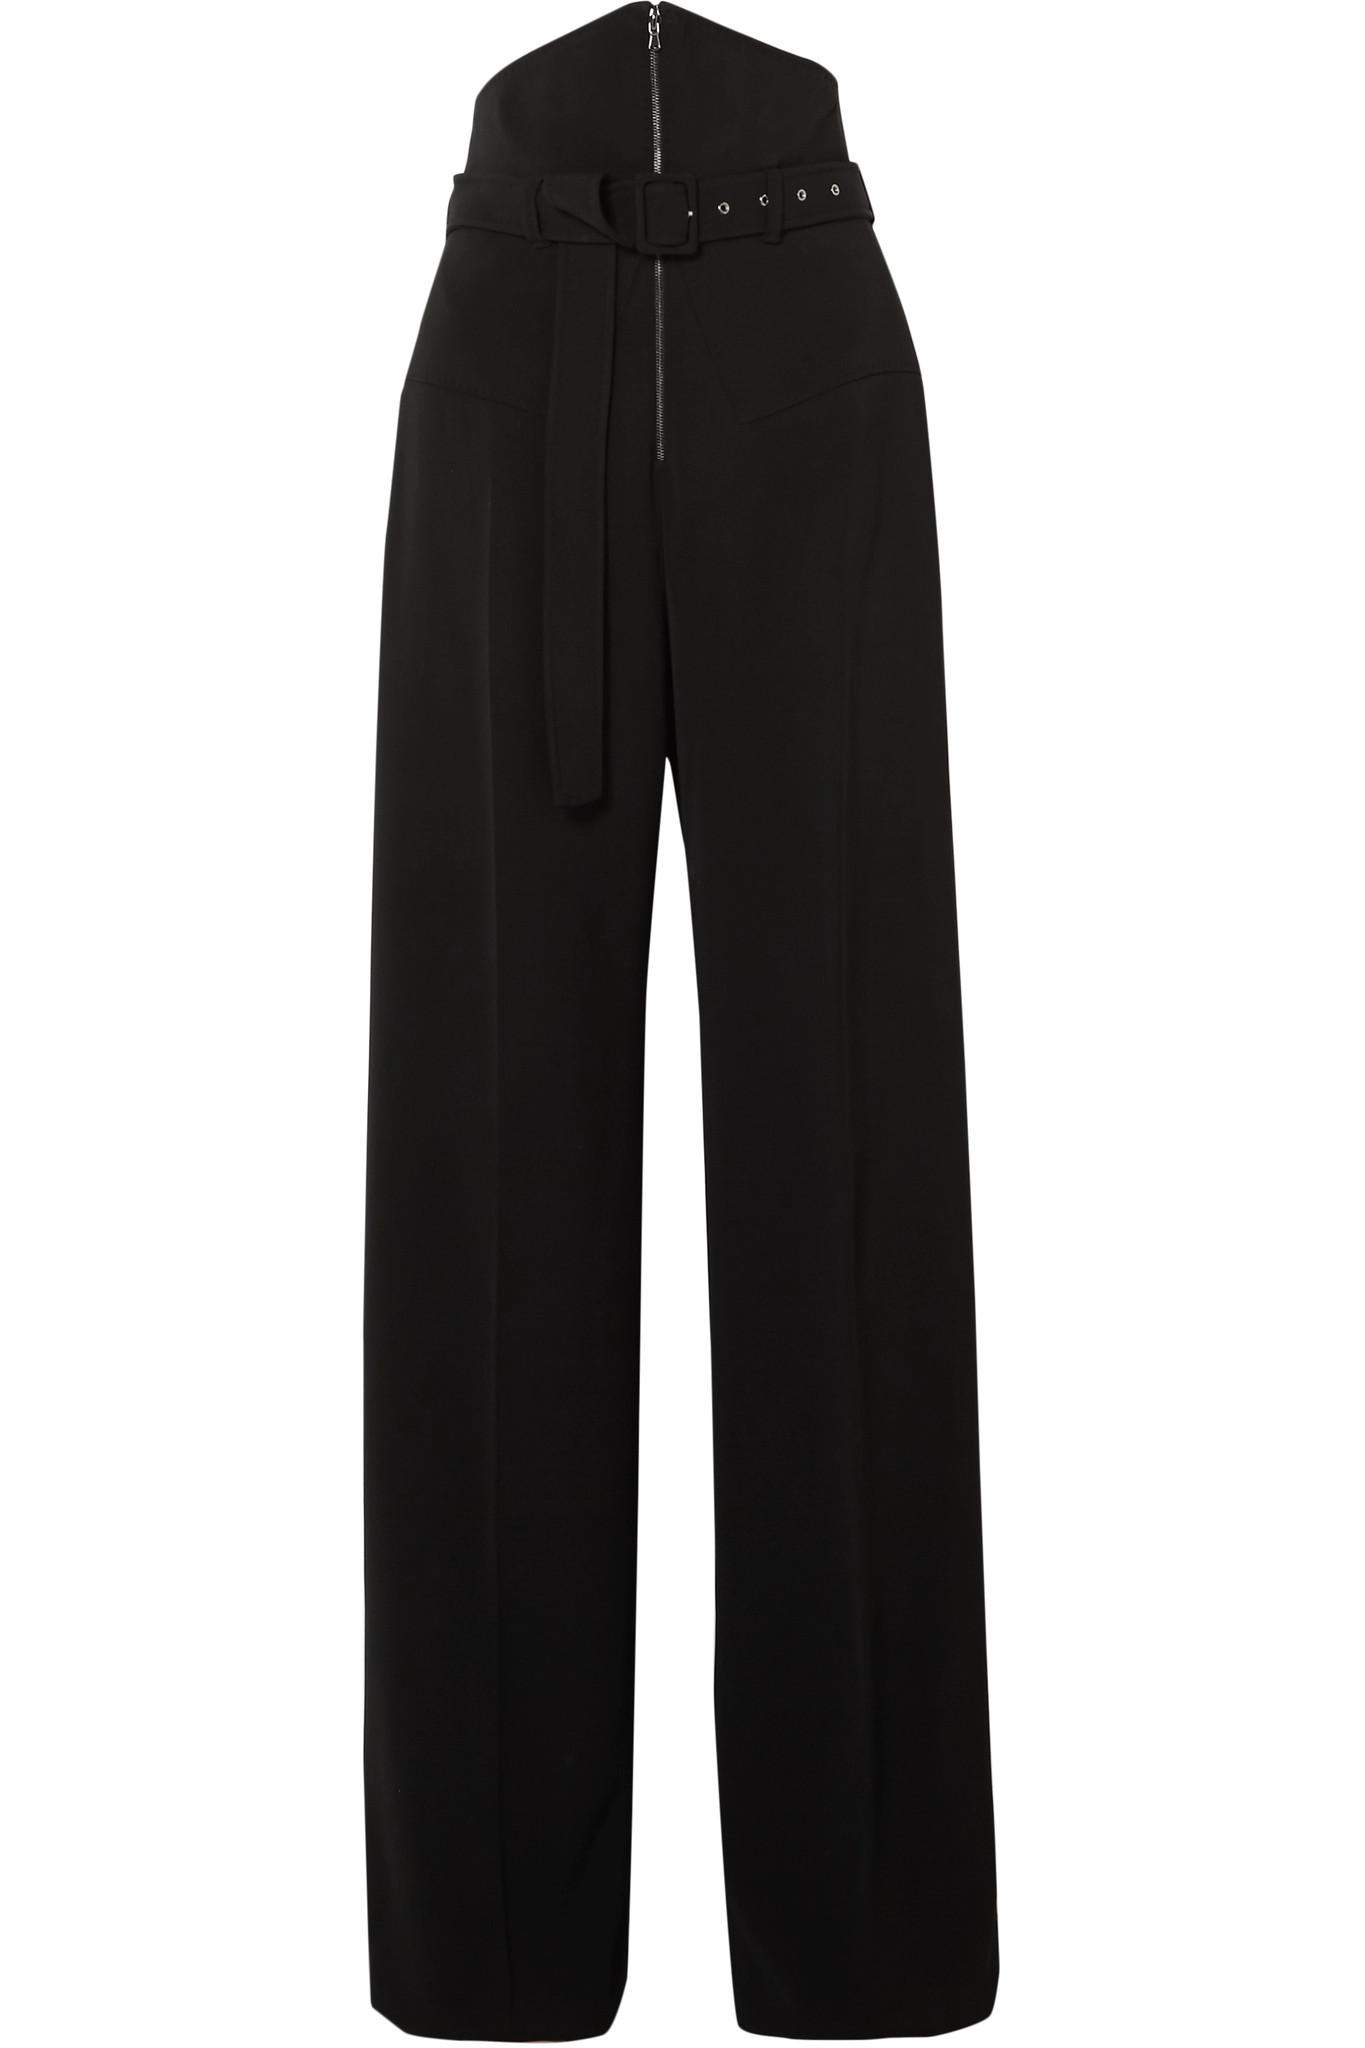 Belted Cady Wide-leg Pants - Black Antonio Berardi Get Authentic Cheap Online FItcc7L9u